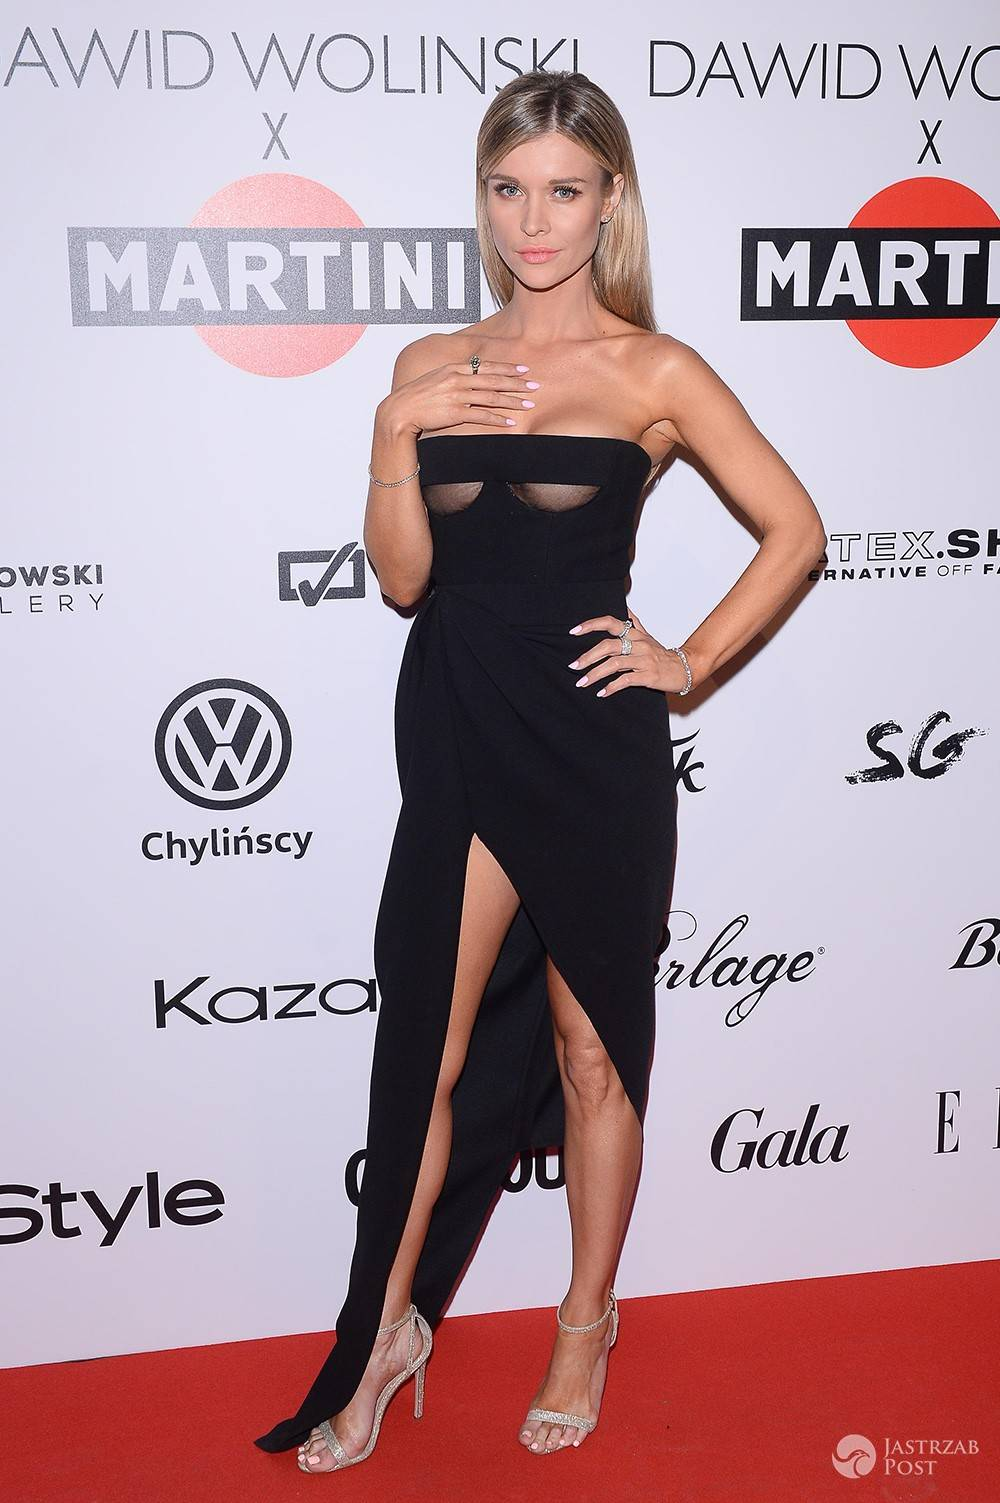 Joanna Krupa - Dawid Woliński x Martini, 2017